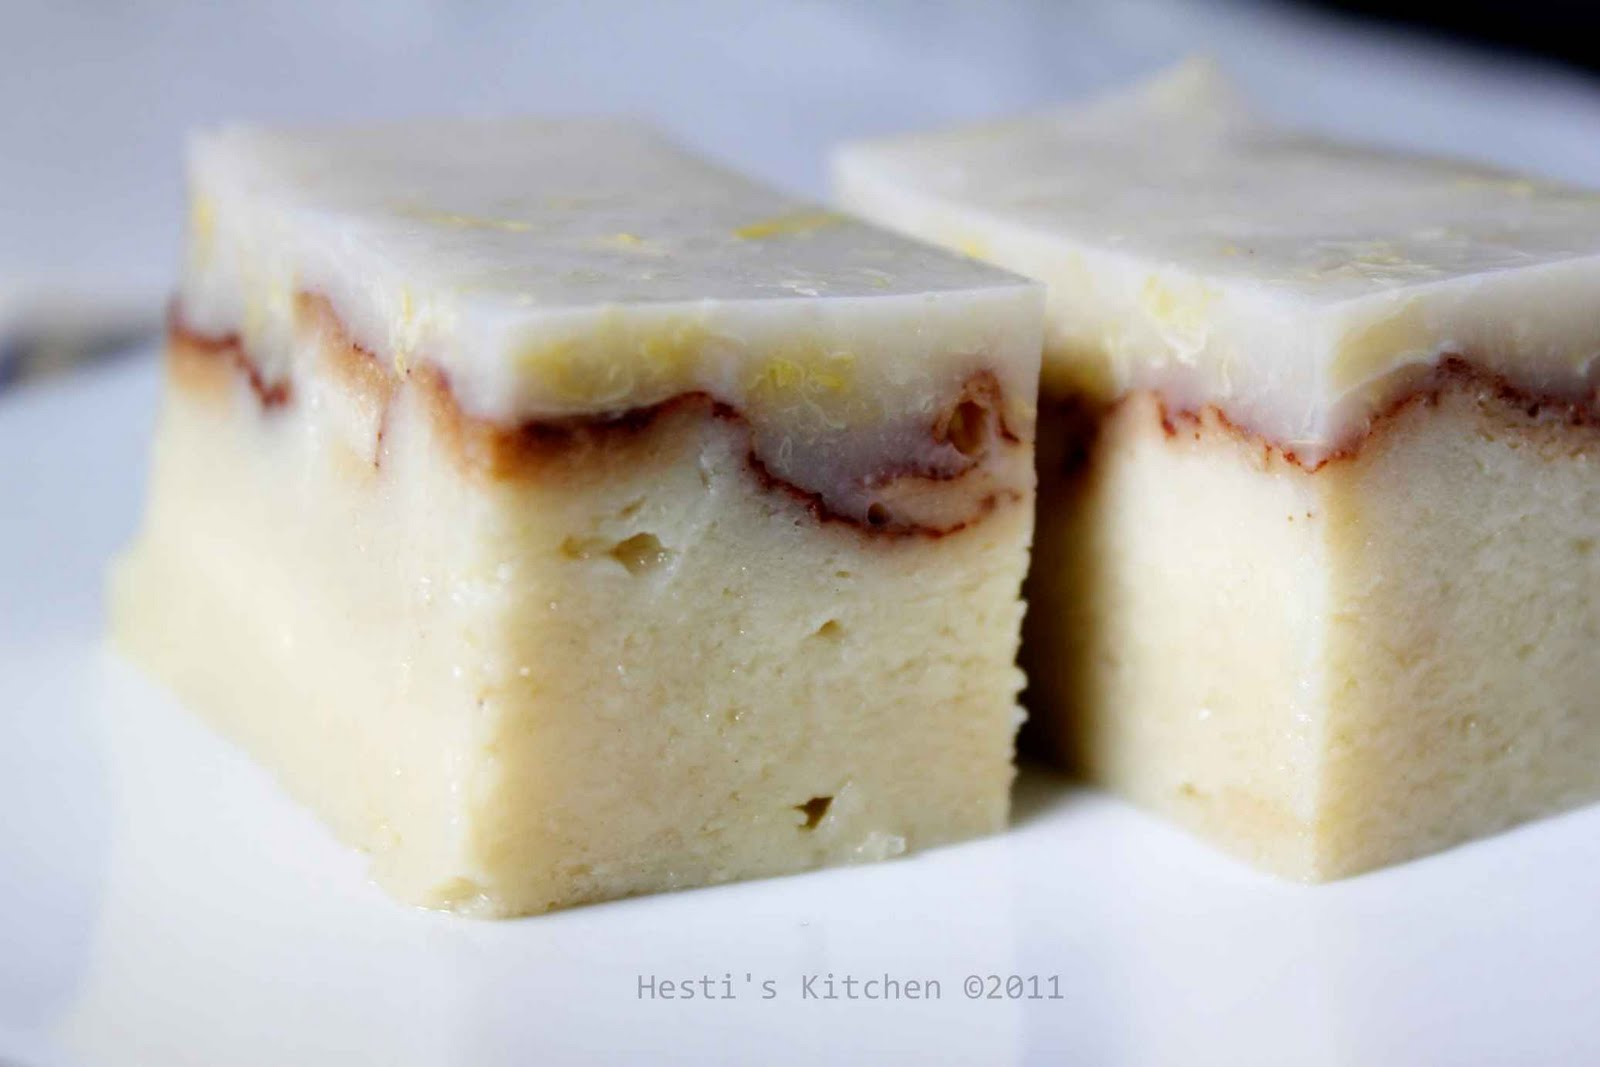 Resep Cake Kukus Hesti Kitchen: HESTI'S KITCHEN : Yummy For Your Tummy: Puding Roti